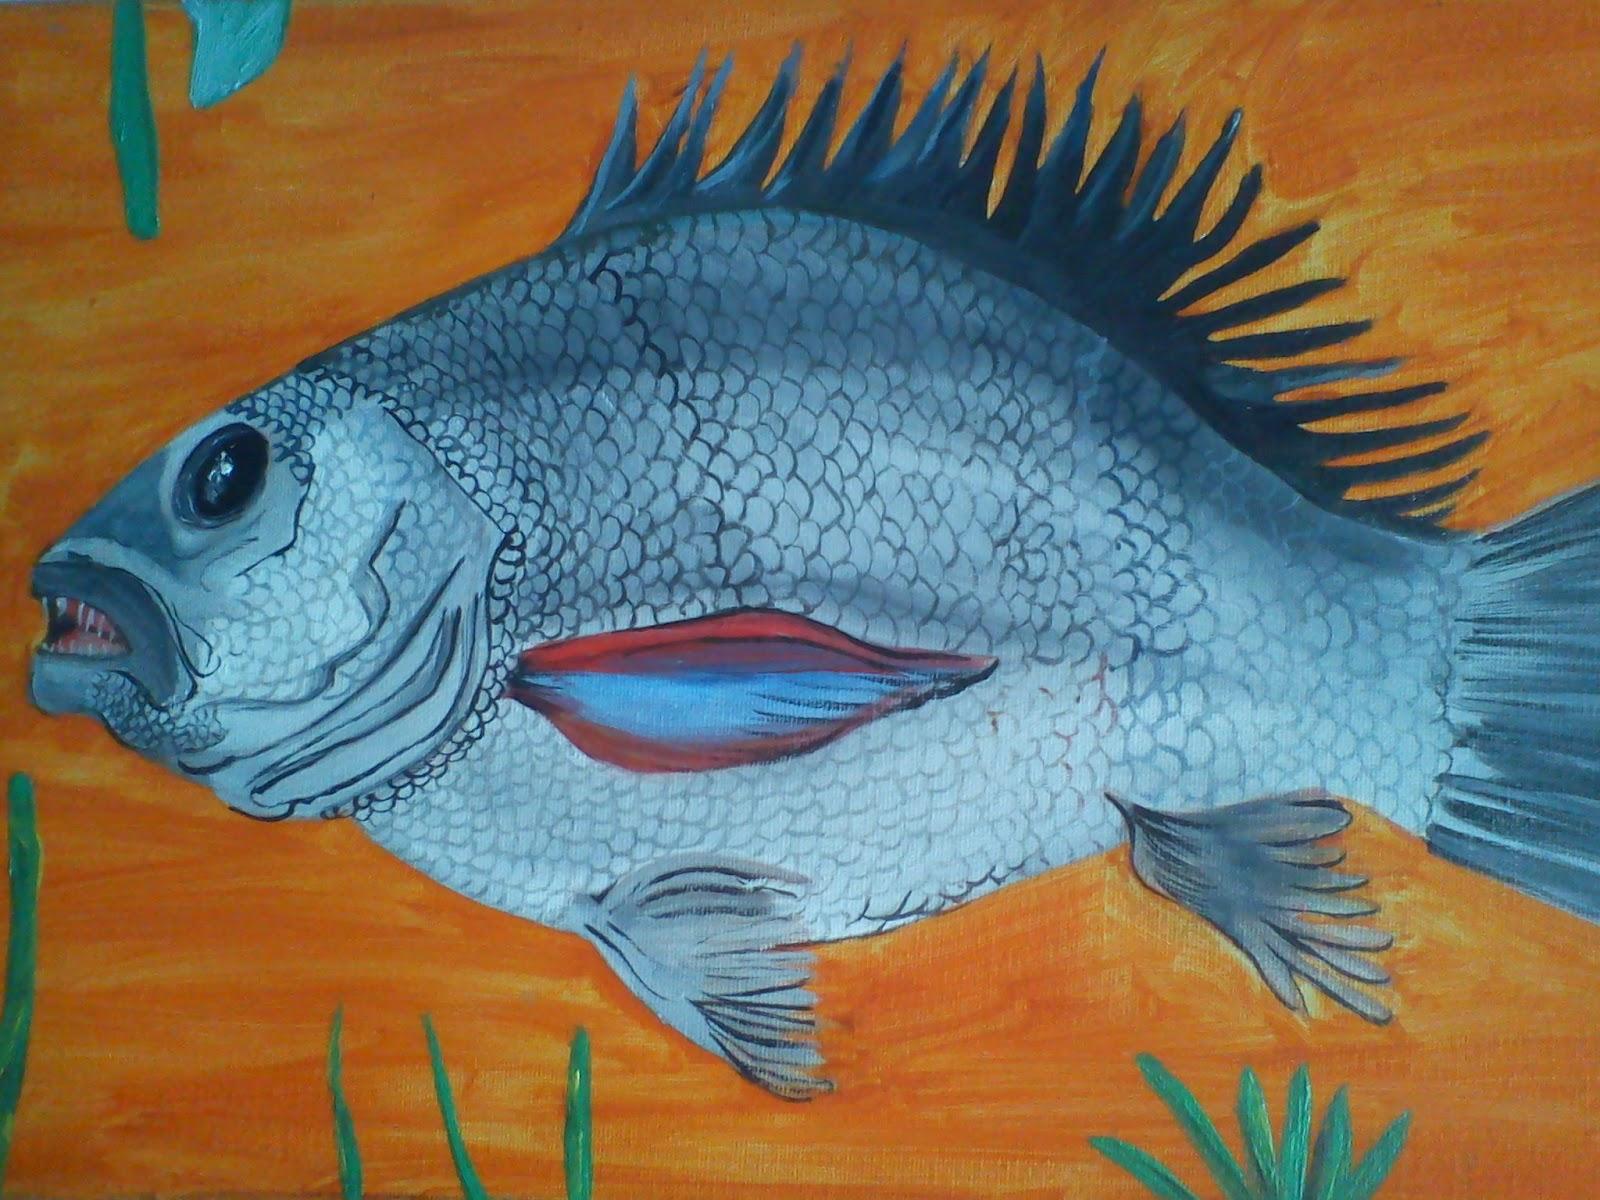 Chelita newball artista plastica pintura primitivista for Cuadros de peces